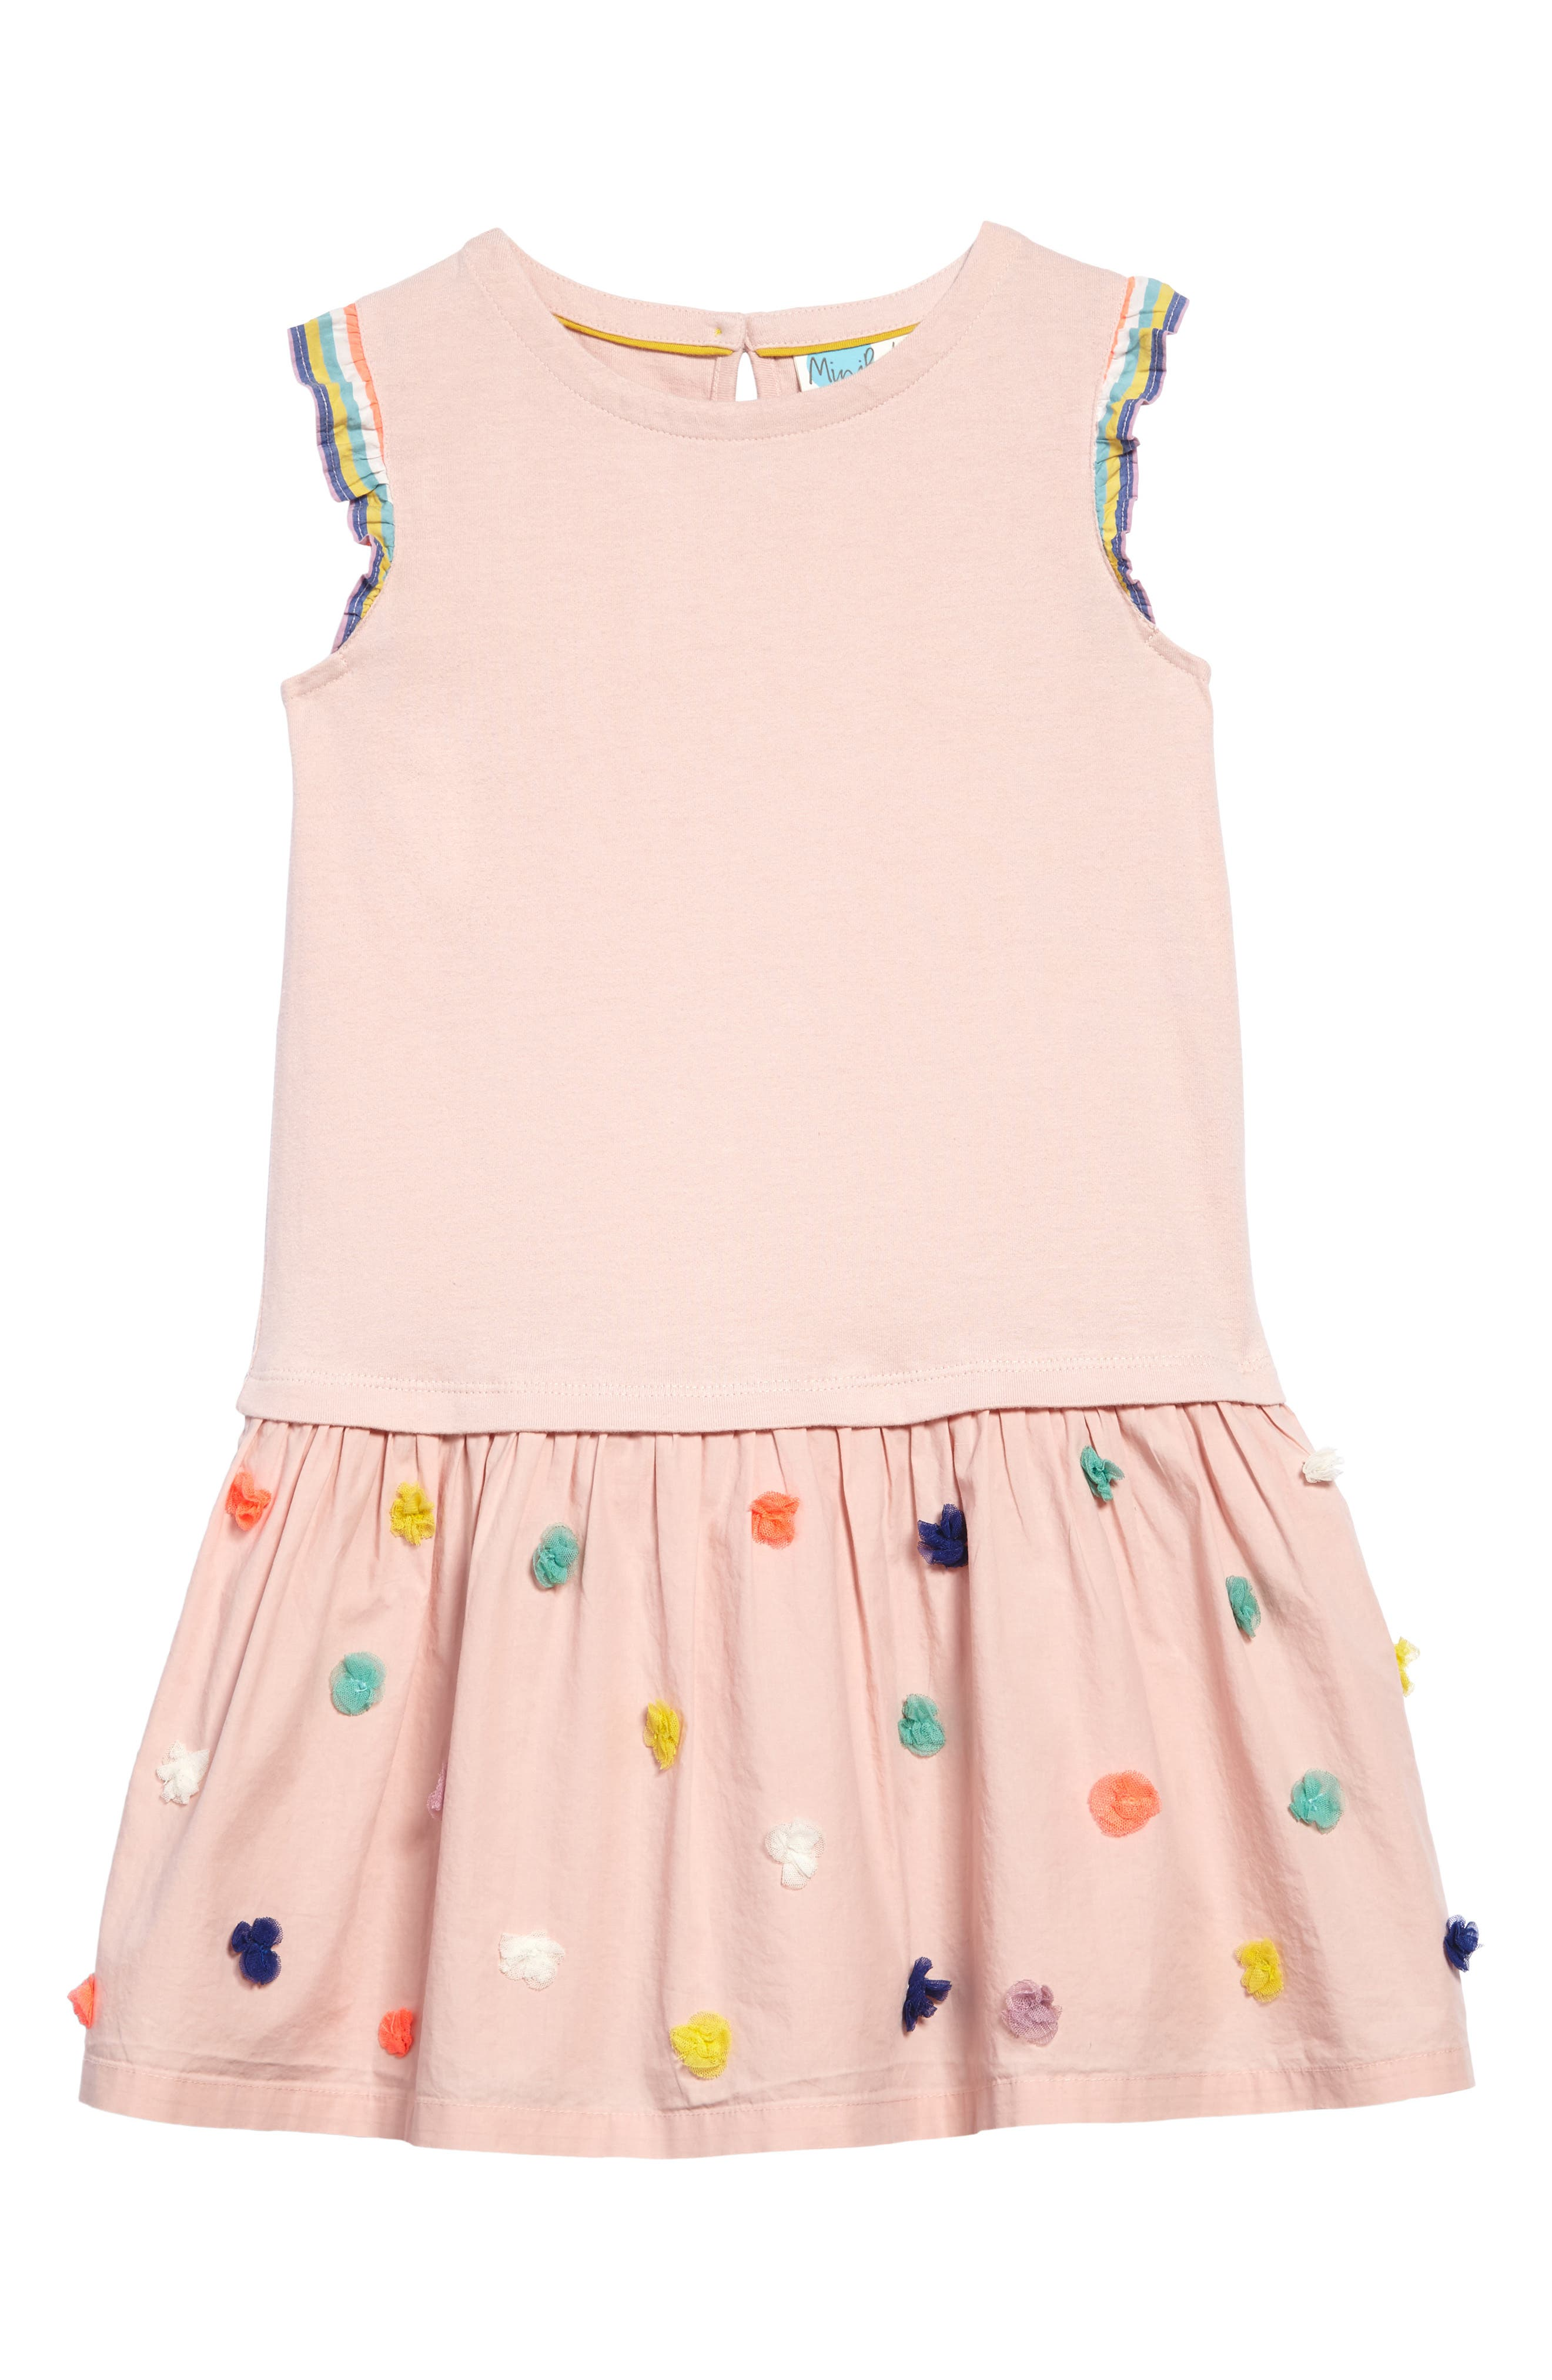 Alternate Image 1 Selected - Mini Boden Fun Knit-to-Woven Dress (Toddler Girls, Little Girls & Big Girls)